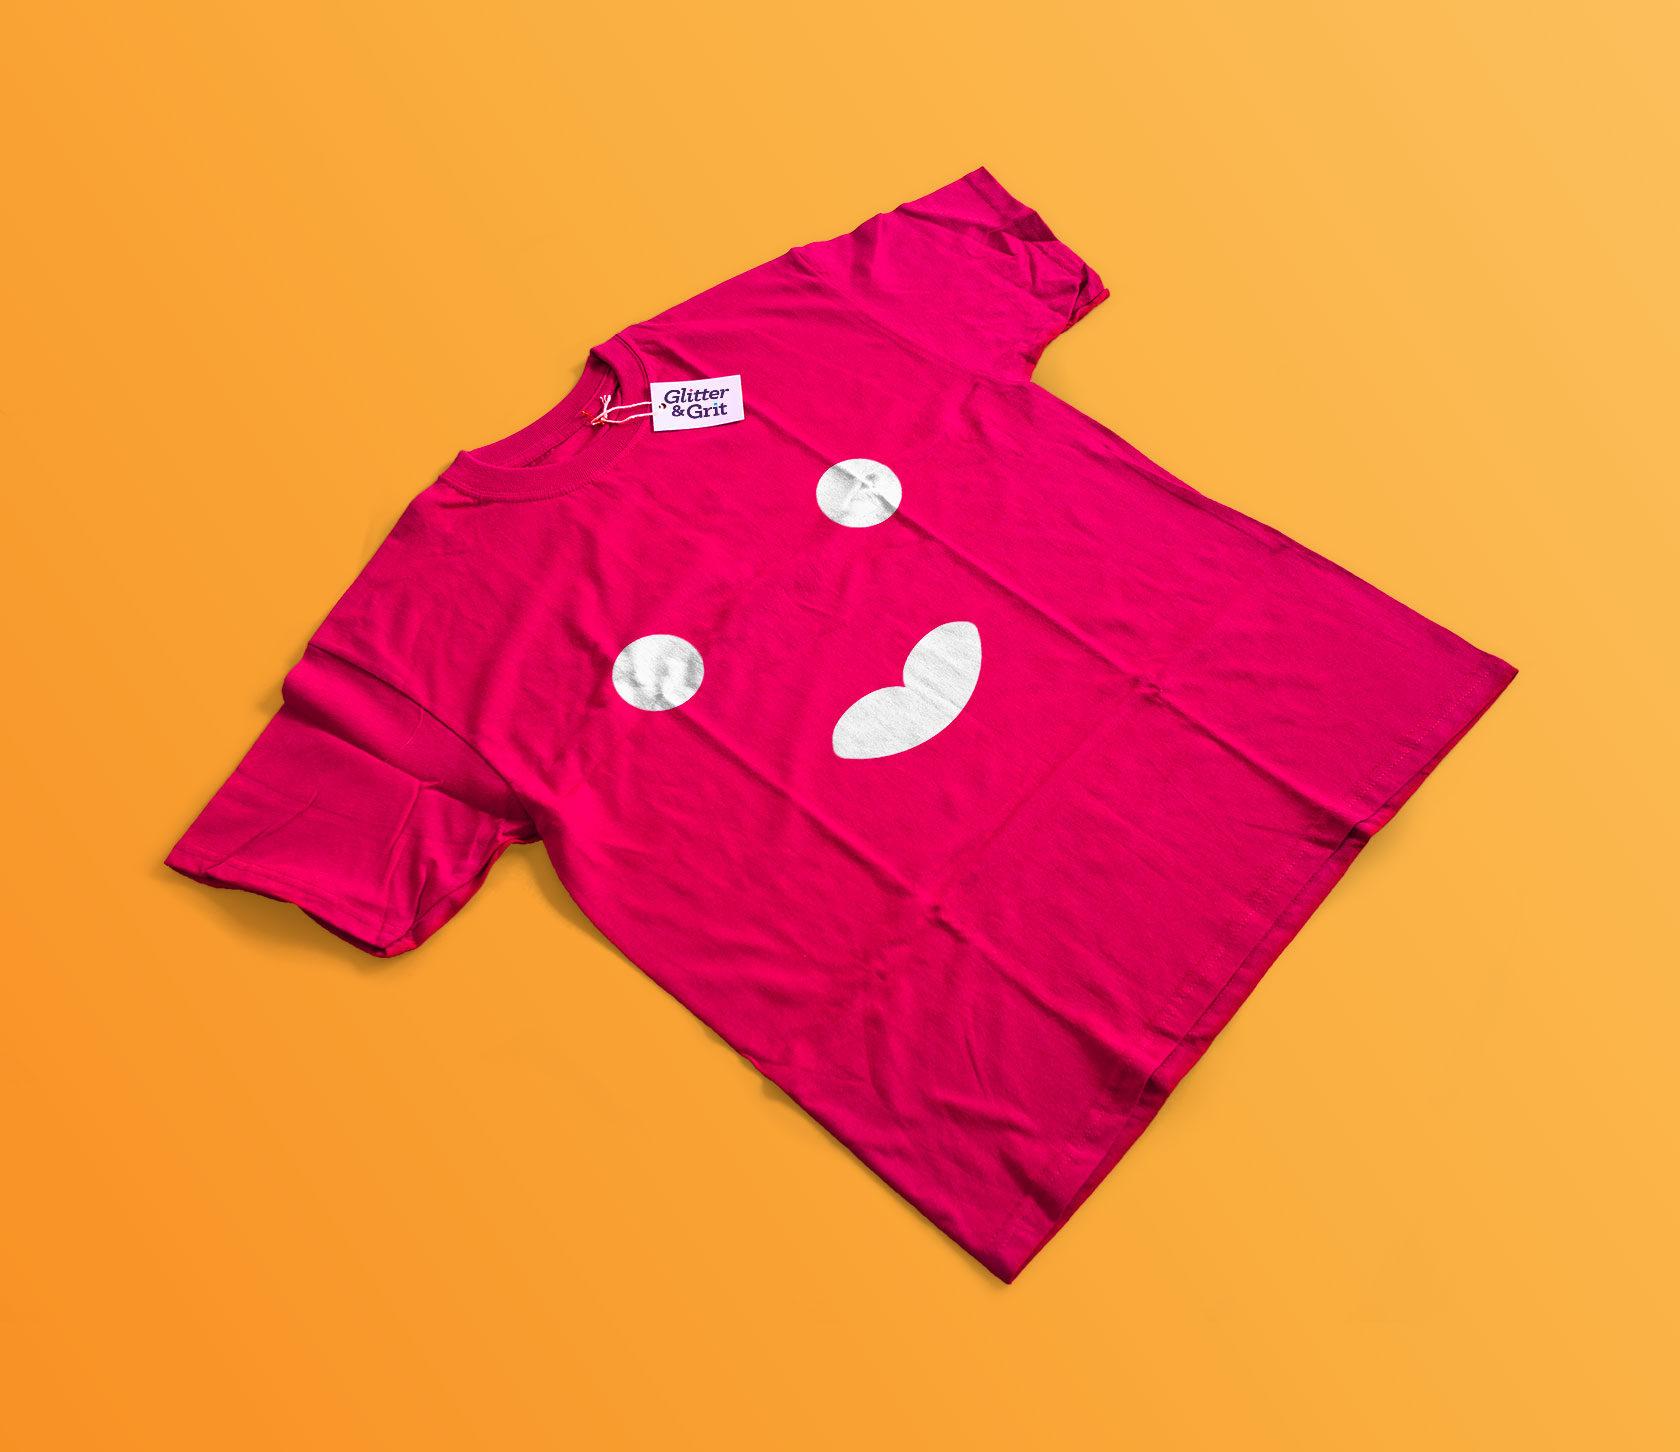 Glitter & Grit Merchandise Design by Furia